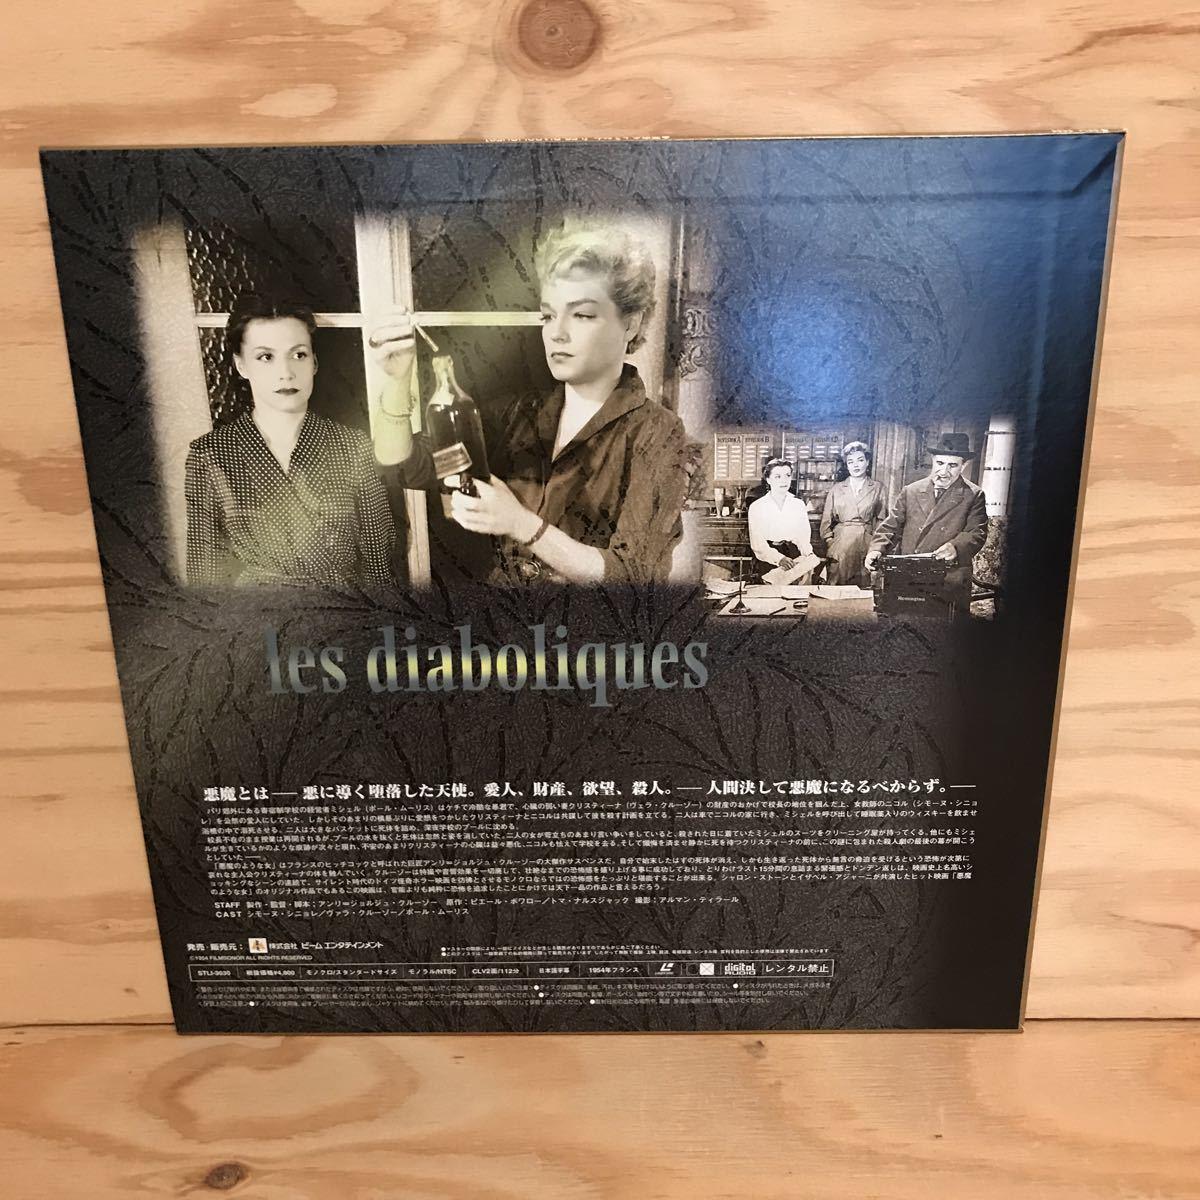 ◎K3FIID-200305 レア[悪魔のような女 les diaboliques]LD レーザーディスク ジョルズ・クルーゾー シモーヌ・シニョレ_画像2